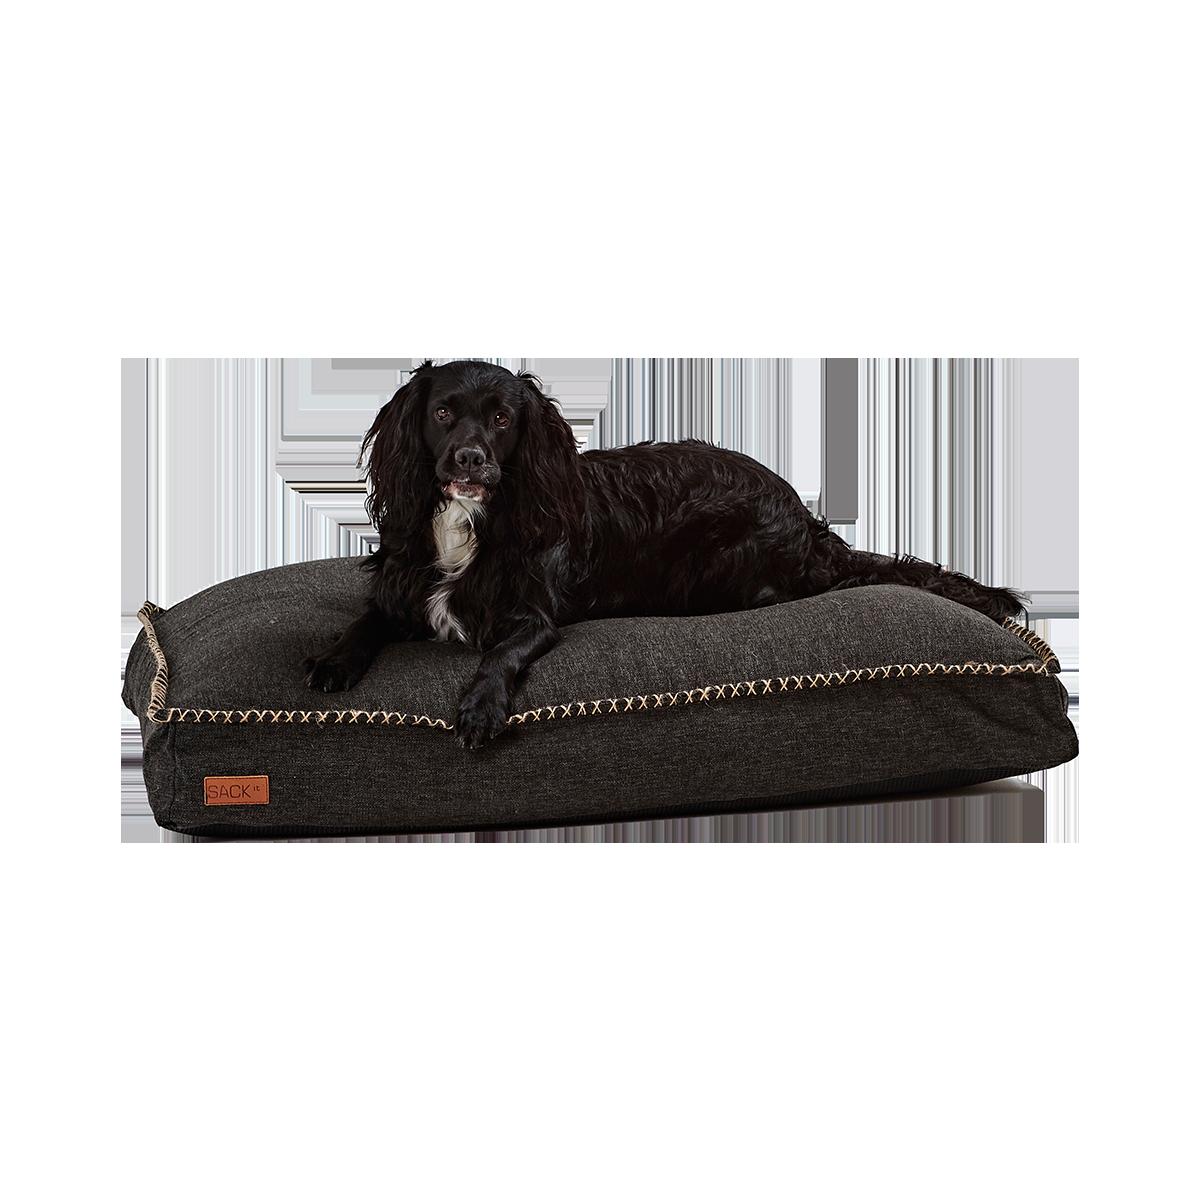 SACKit Dog Bed Large Black